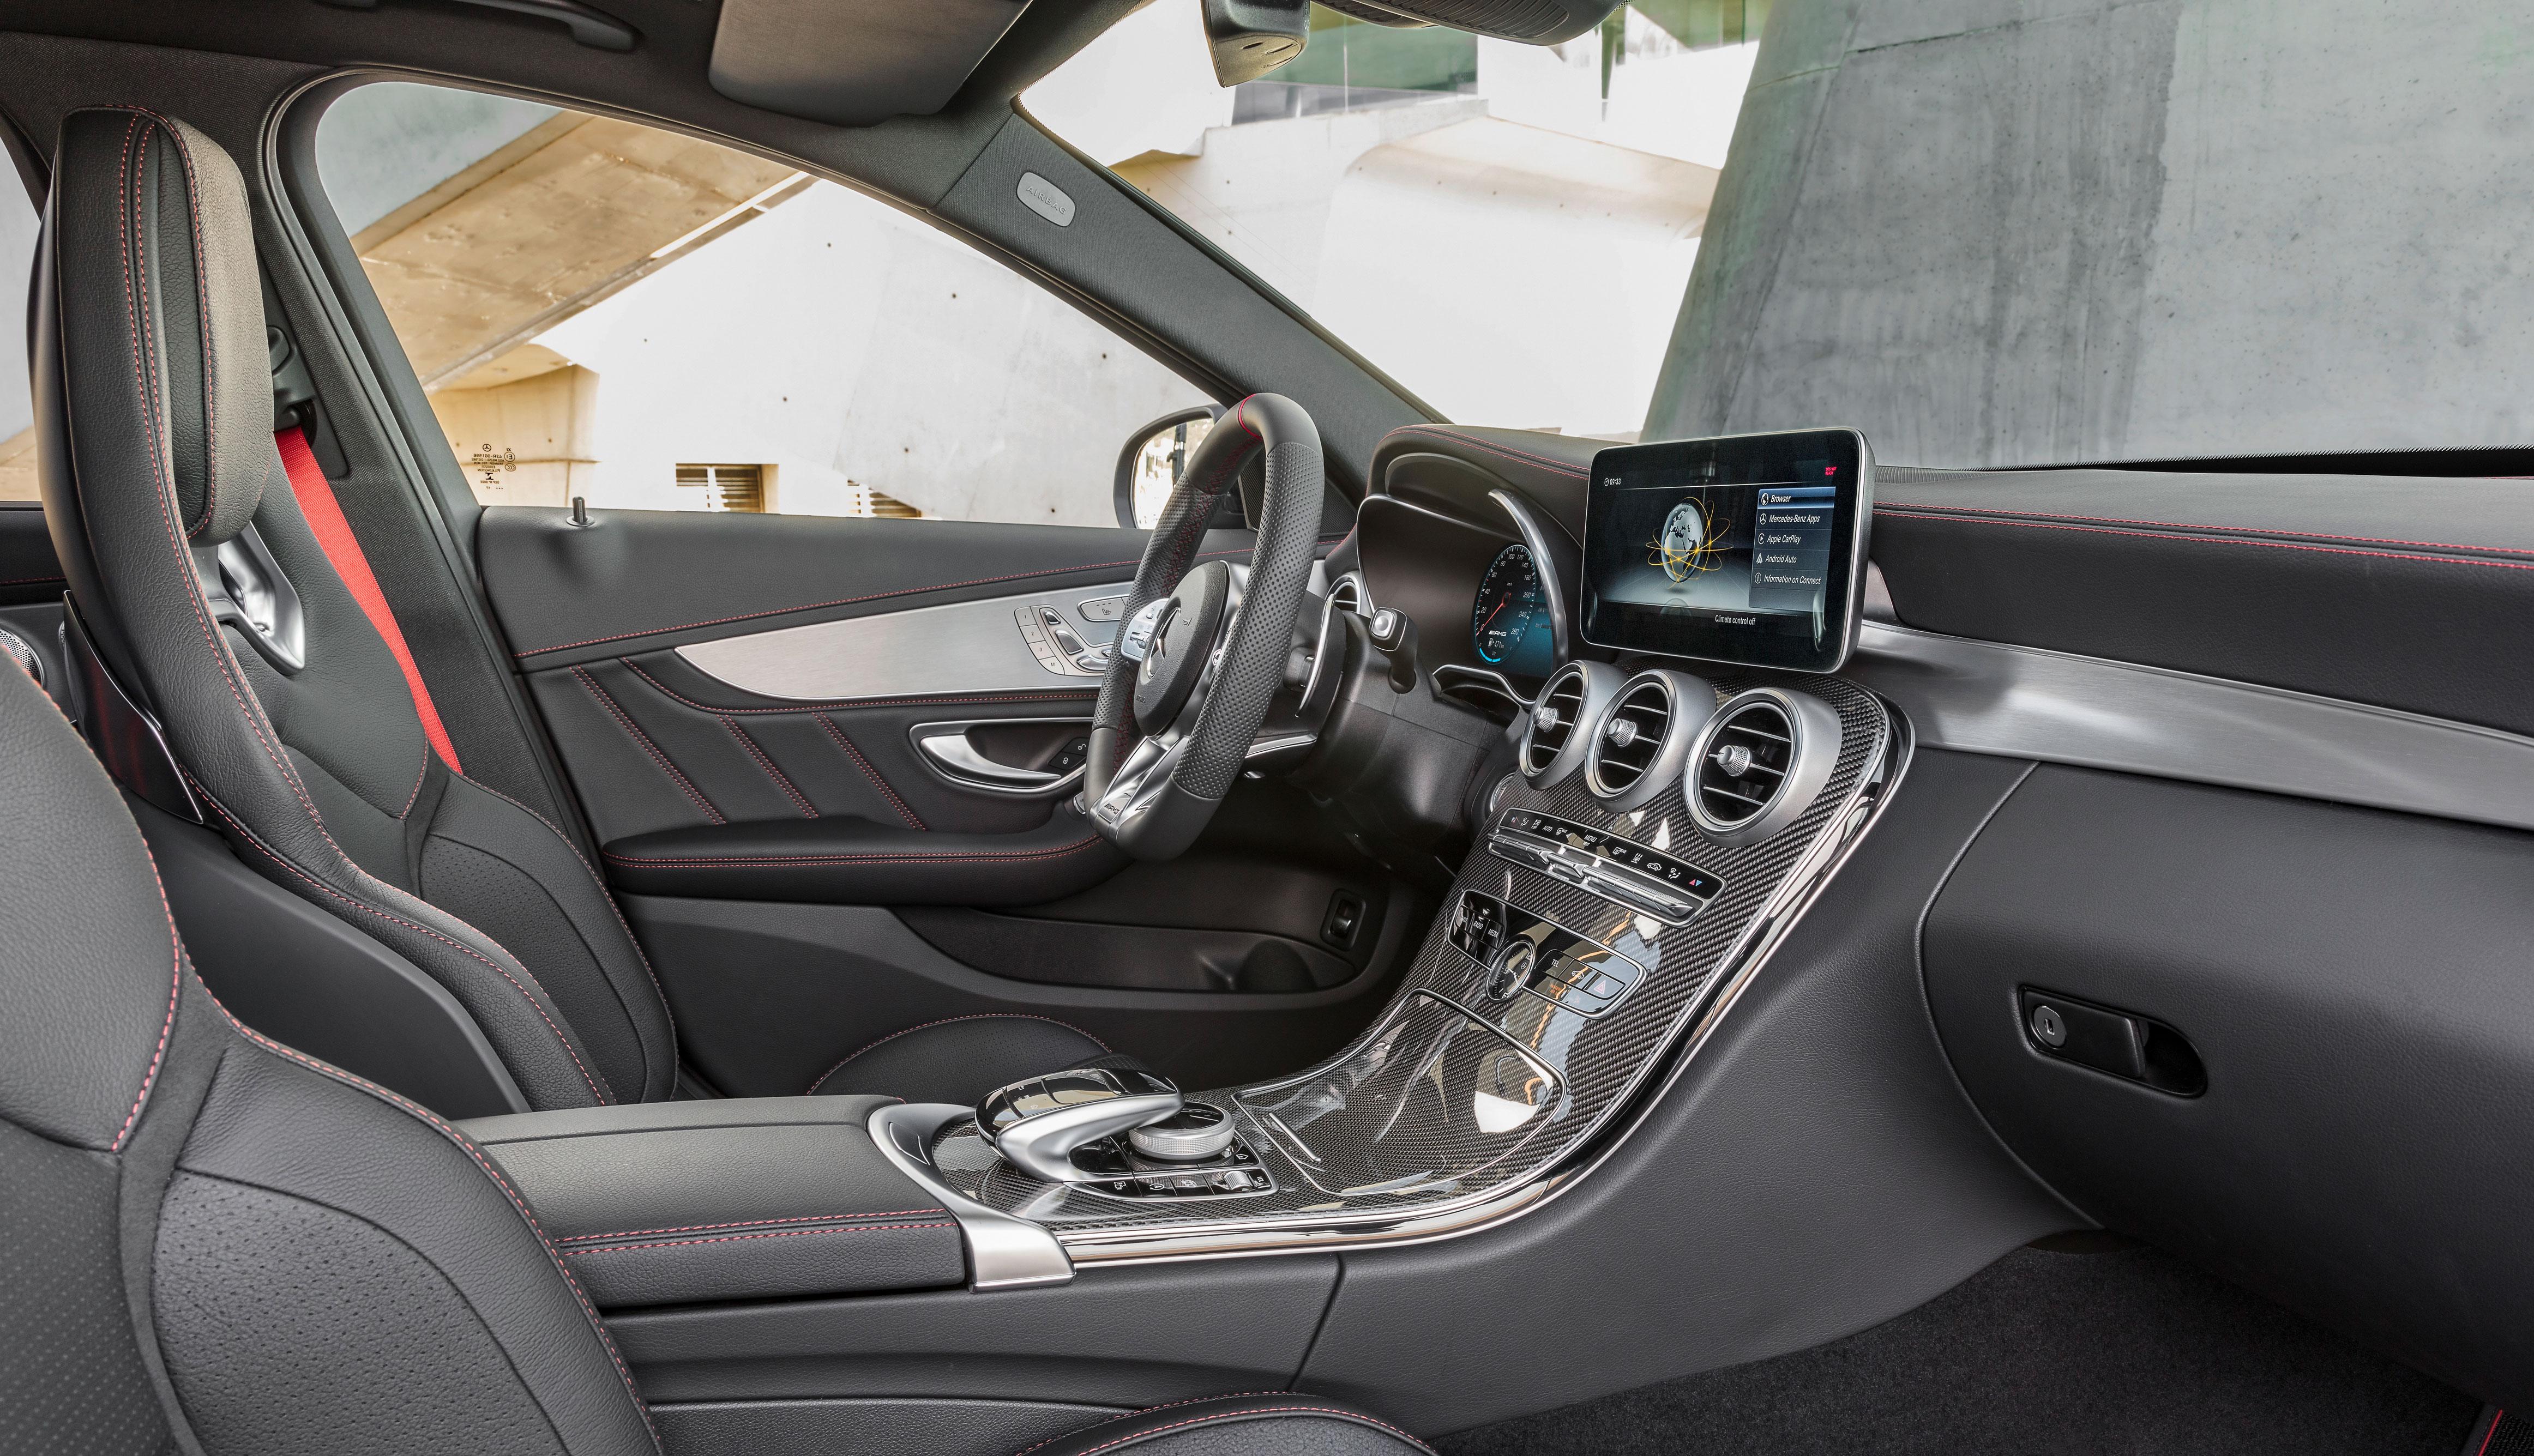 2018 Mercedes-AMG C 43 facelift – AMG's junior saloon